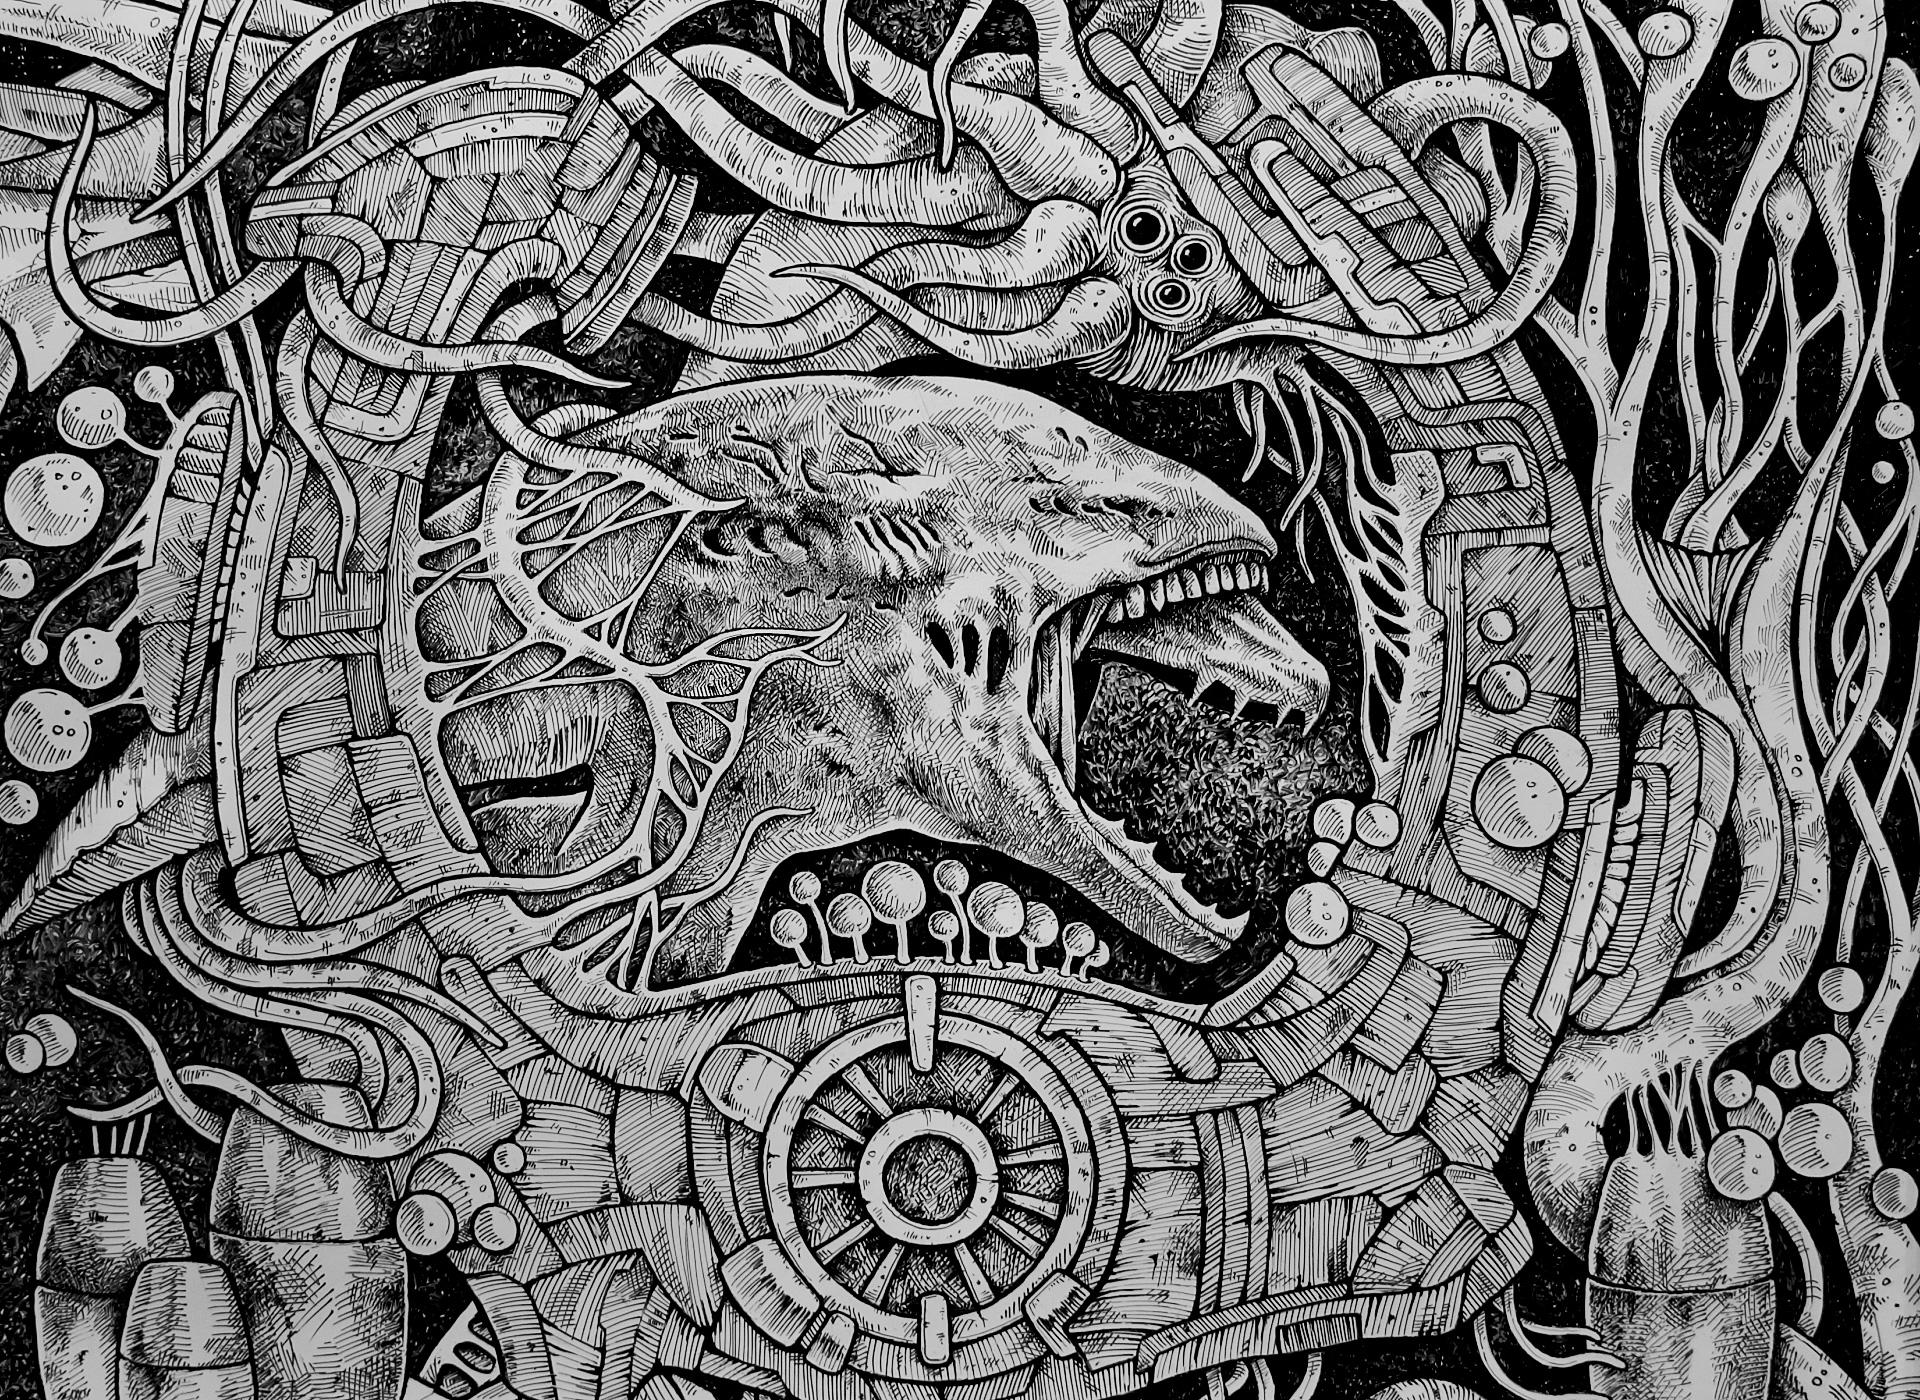 doodles14.jpg